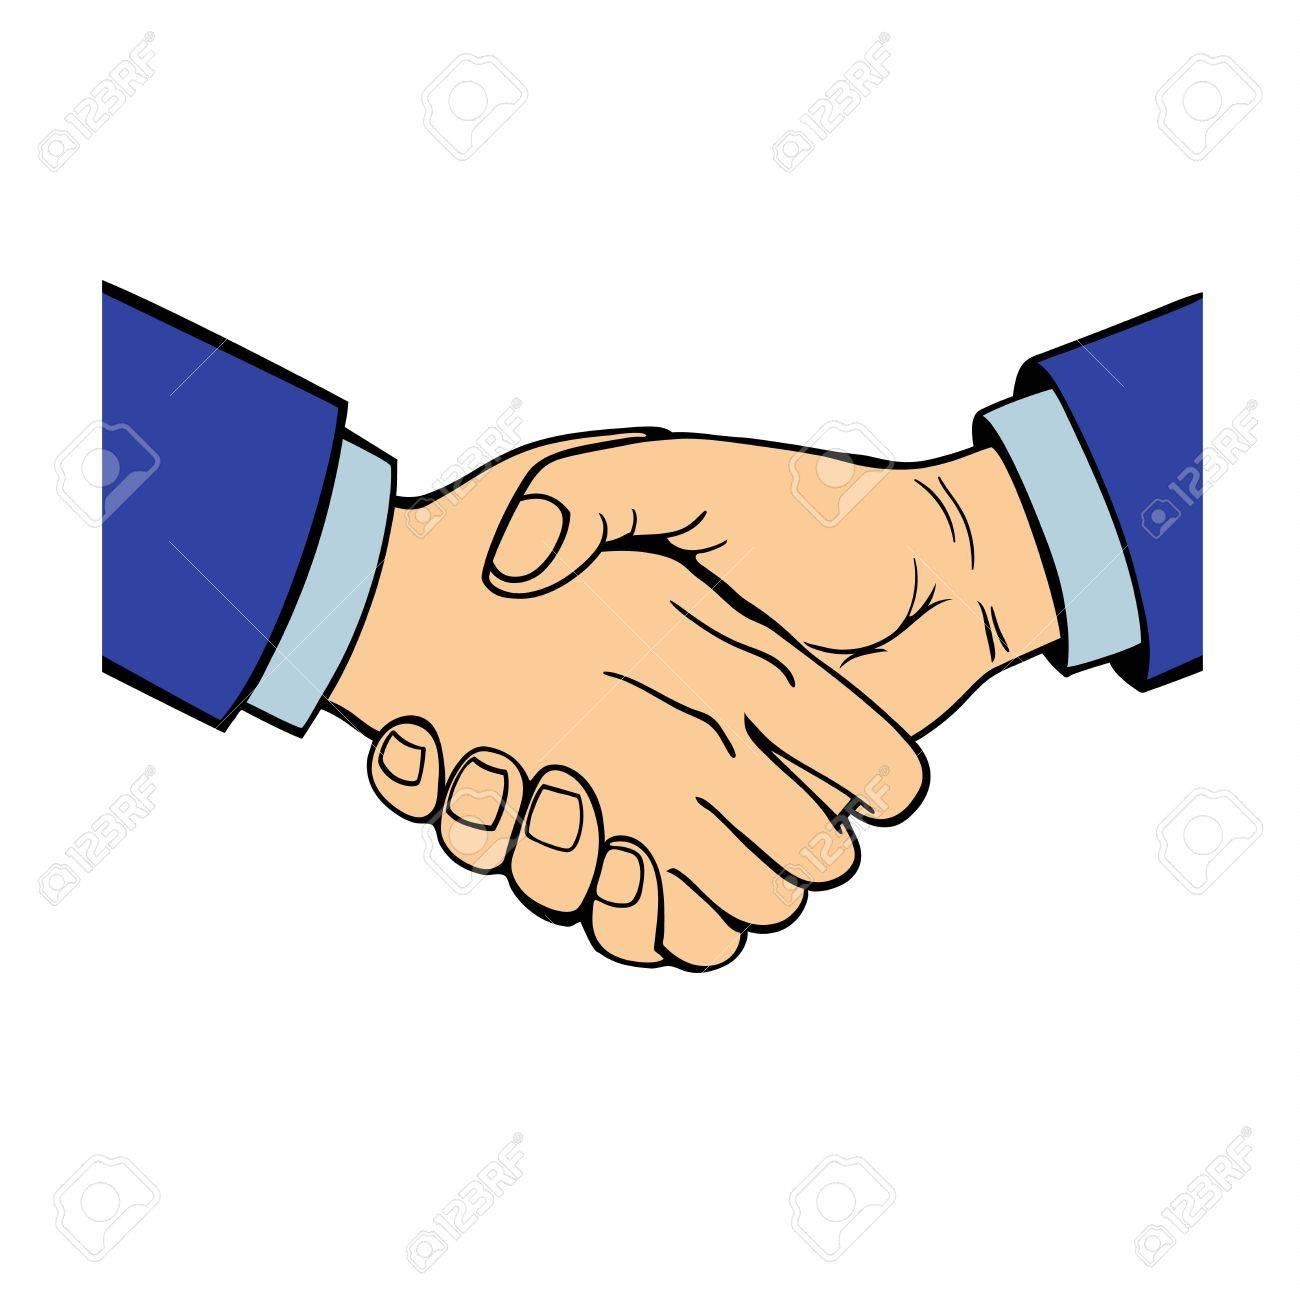 Business people handshake greeting deal at work photo free download - Shaking Hands Business Handshake Partnership Shaking Hands Success Agreement Deal Greeting Businessman Cooperation Shake